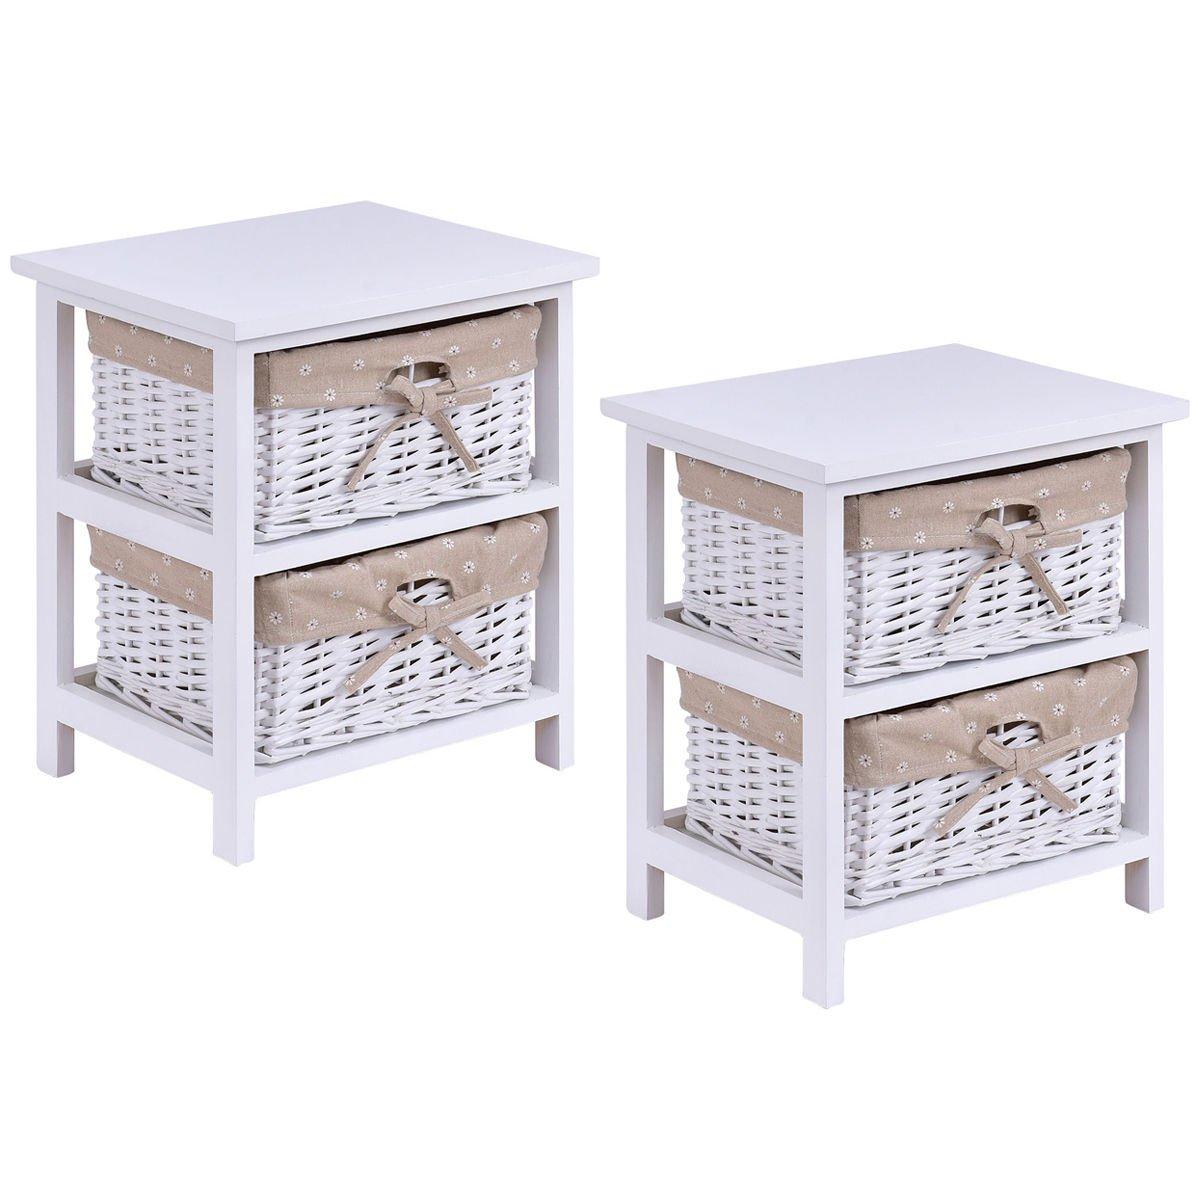 Giantex Set Of 2 Wooden Bedside Table Cabinet Bedroom Furniture W/ 2 Wicker Rattan Drawers